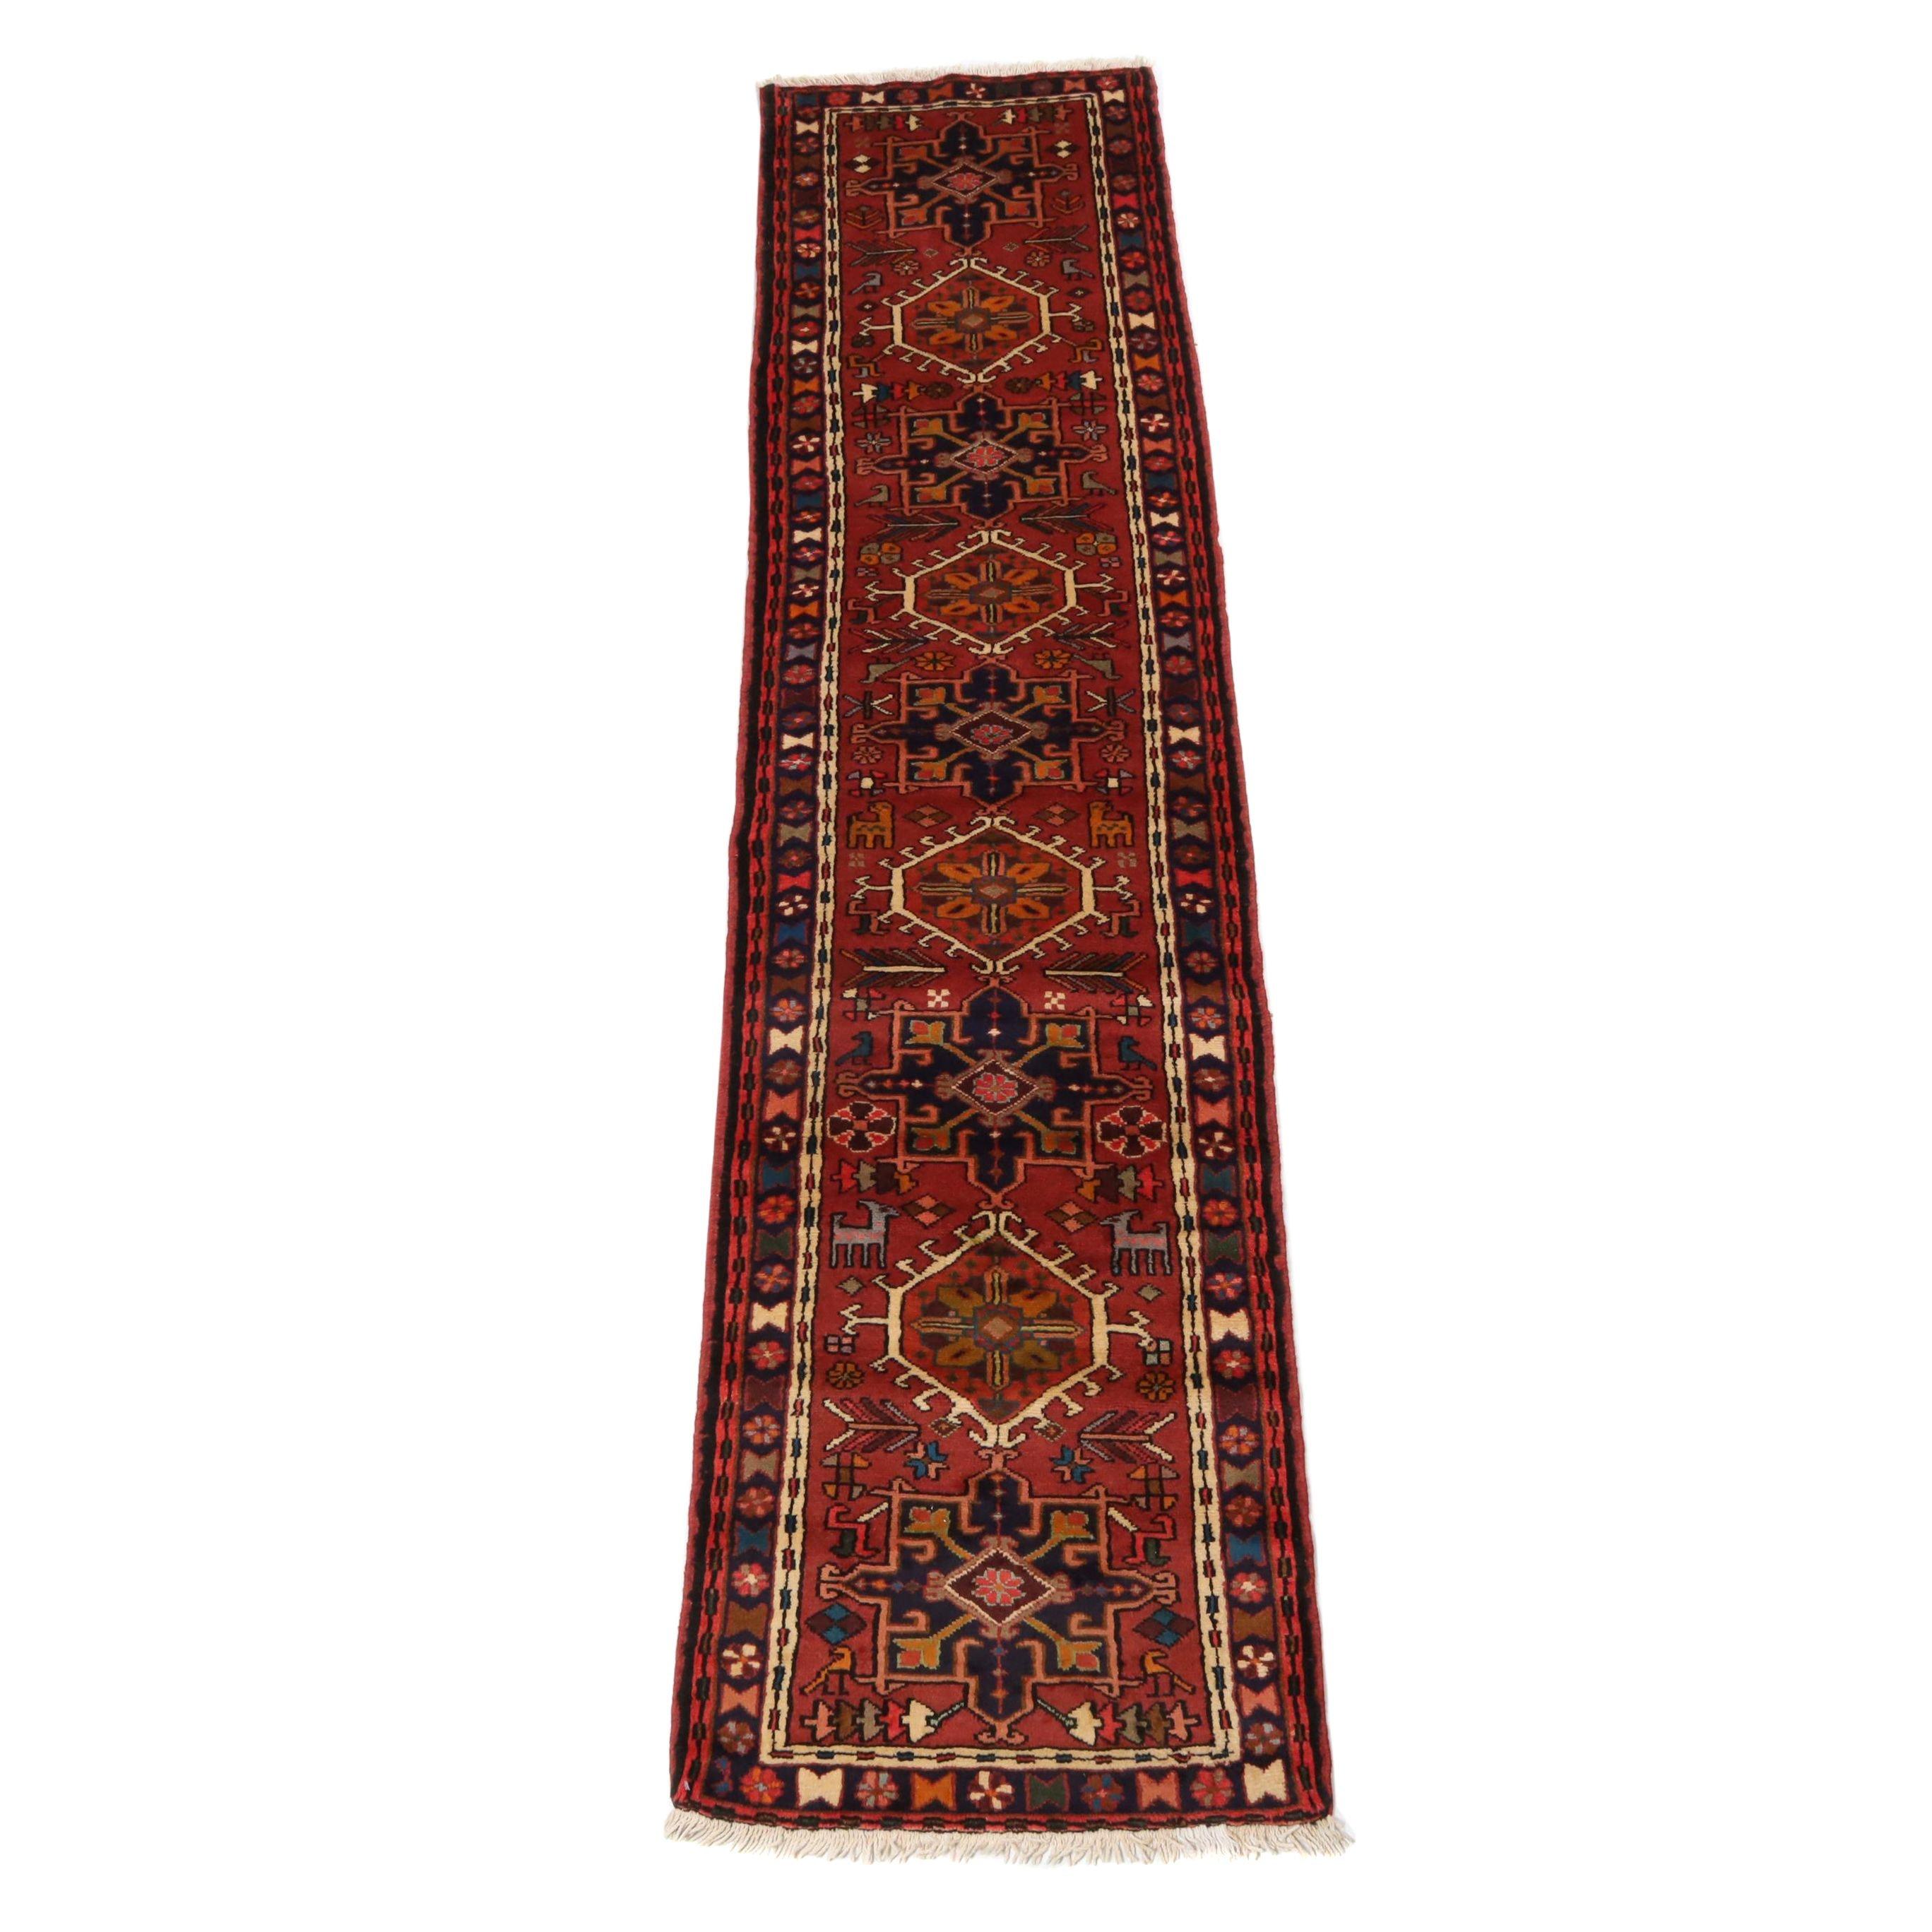 2.4' x 9.6' Hand-Knotted Persian Karajeh Rug Runner, Circa 1970s